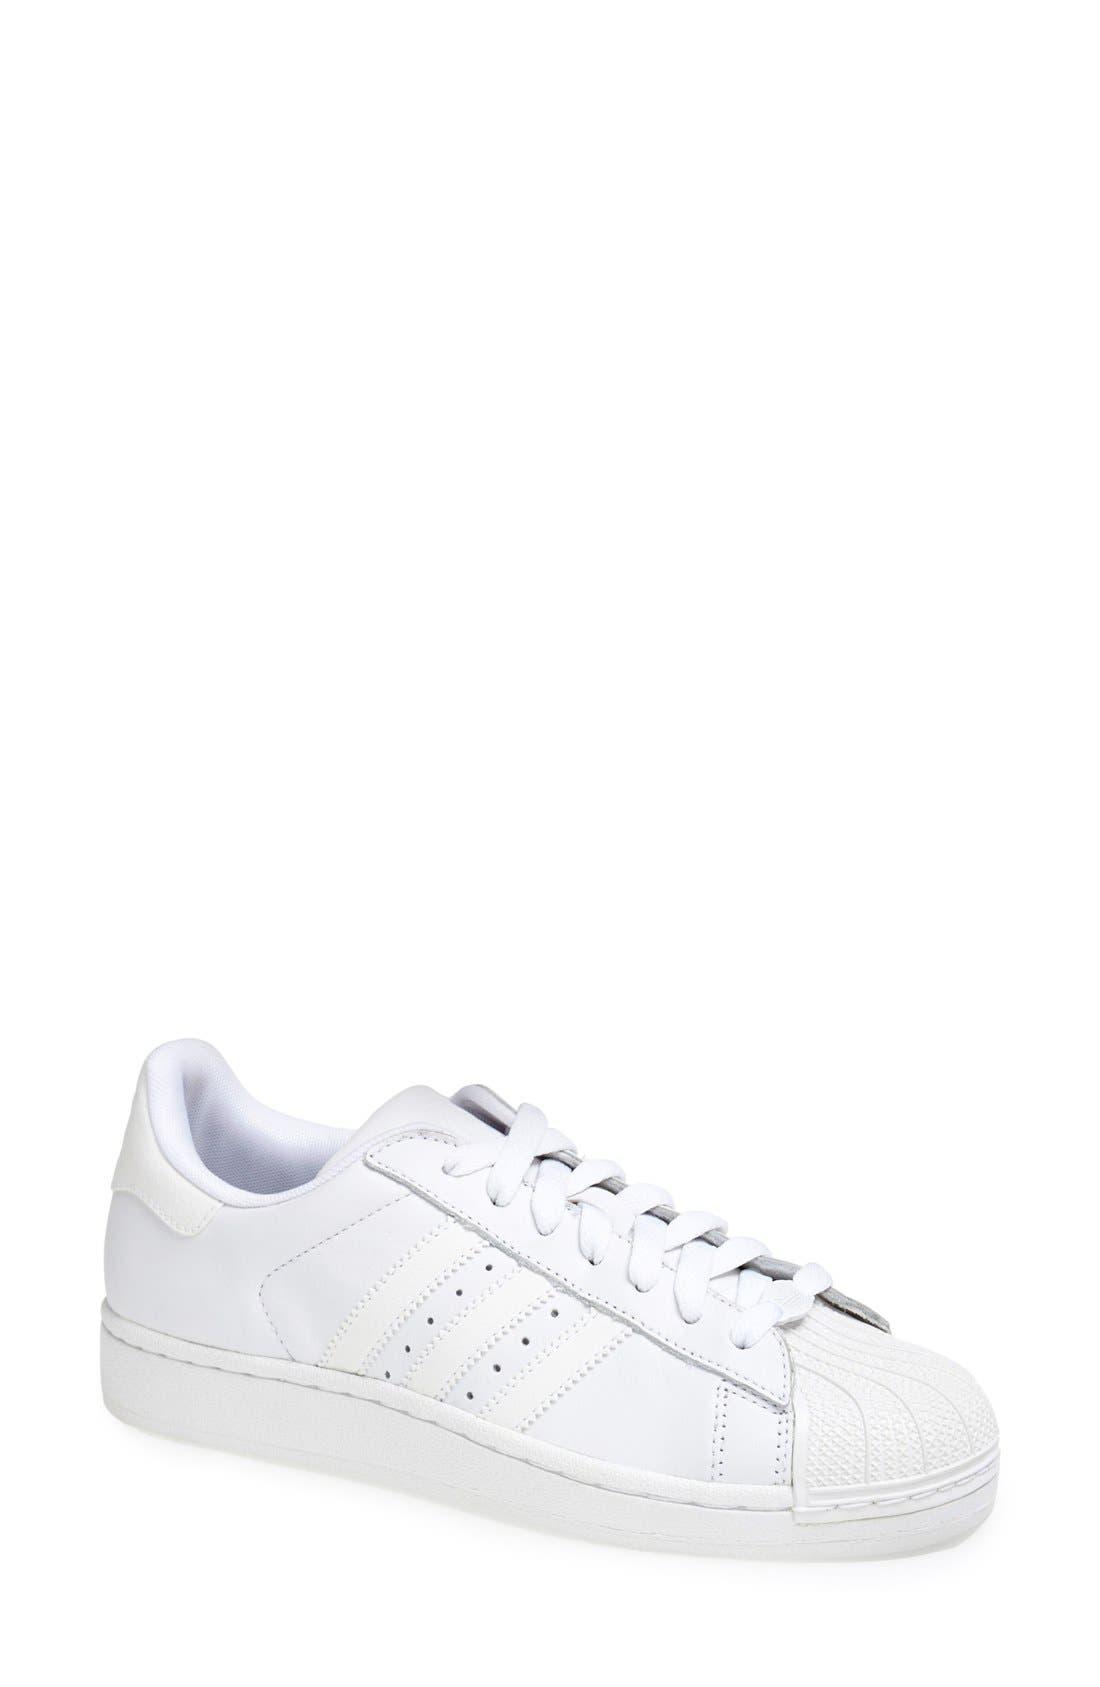 Alternate Image 1 Selected - adidas 'Superstar II' Sneaker (Women)